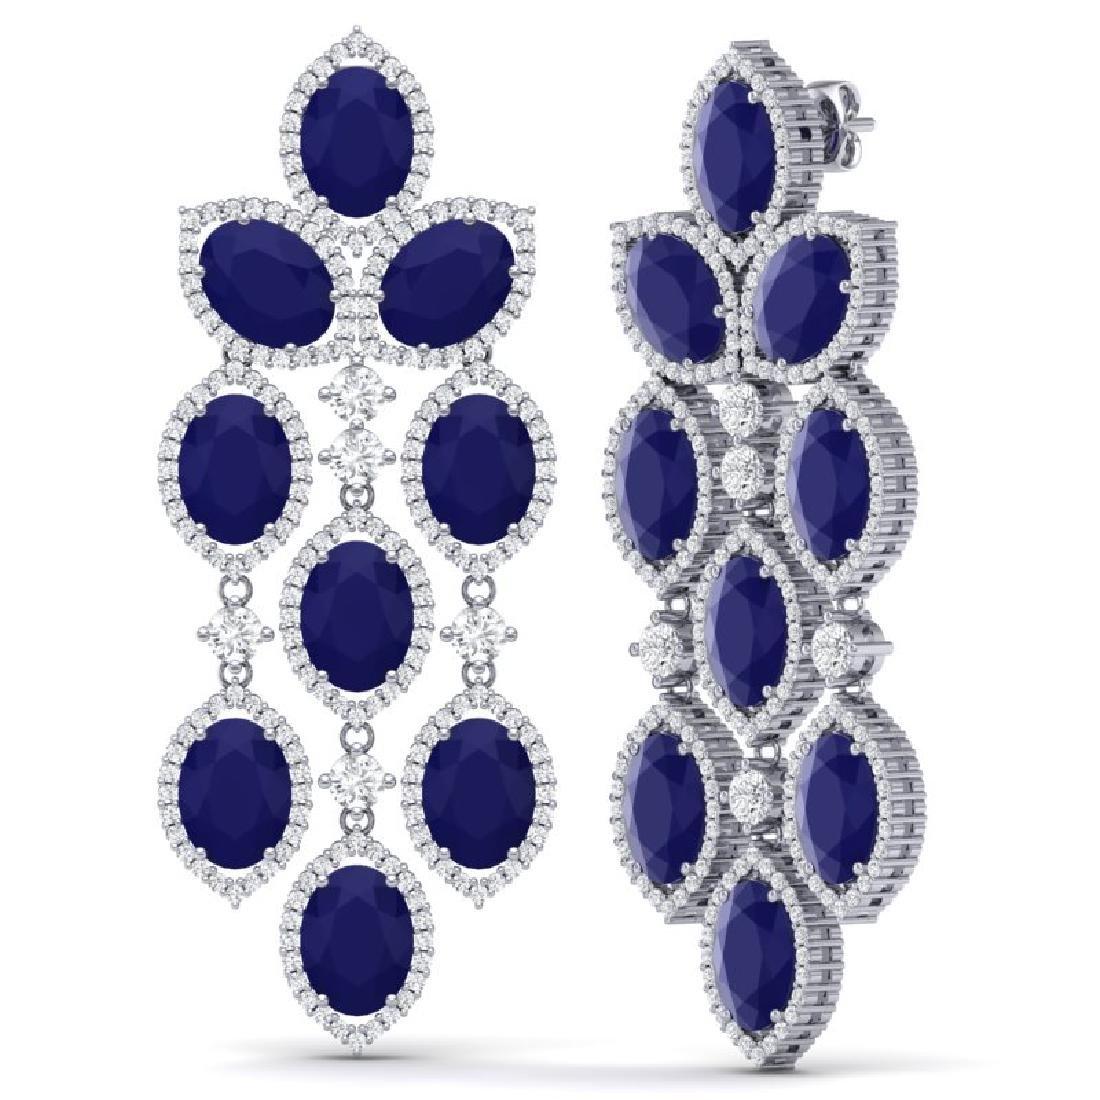 26.15 CTW Royalty Sapphire & VS Diamond Earrings 18K - 2